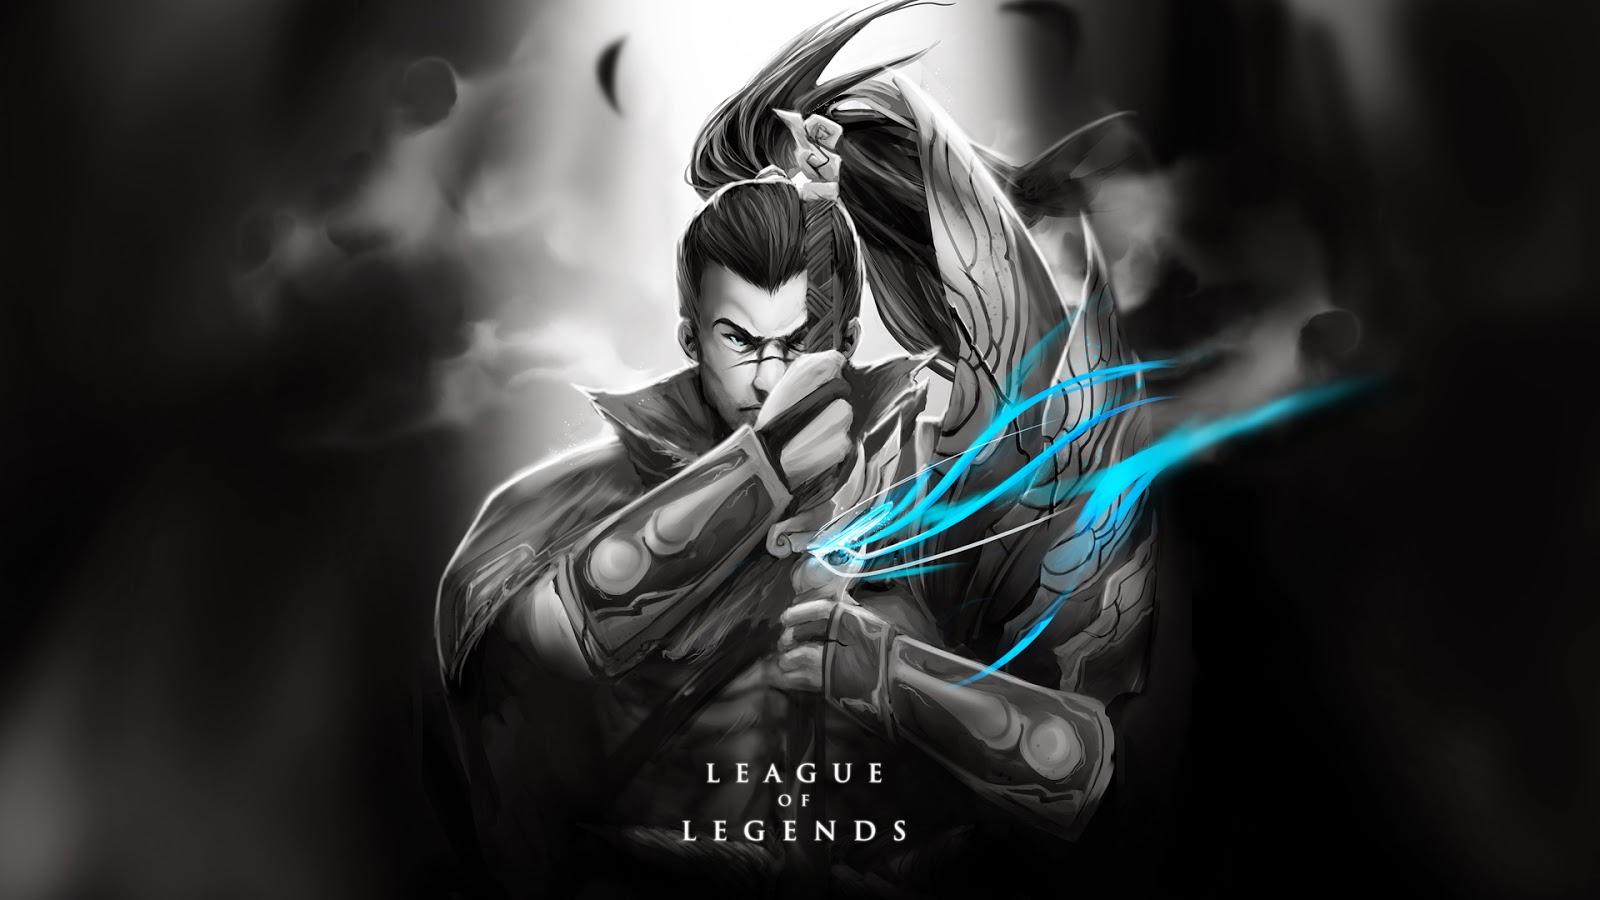 Yasuo League of Legends Wallpaper, Yasuo Desktop Wallpaper